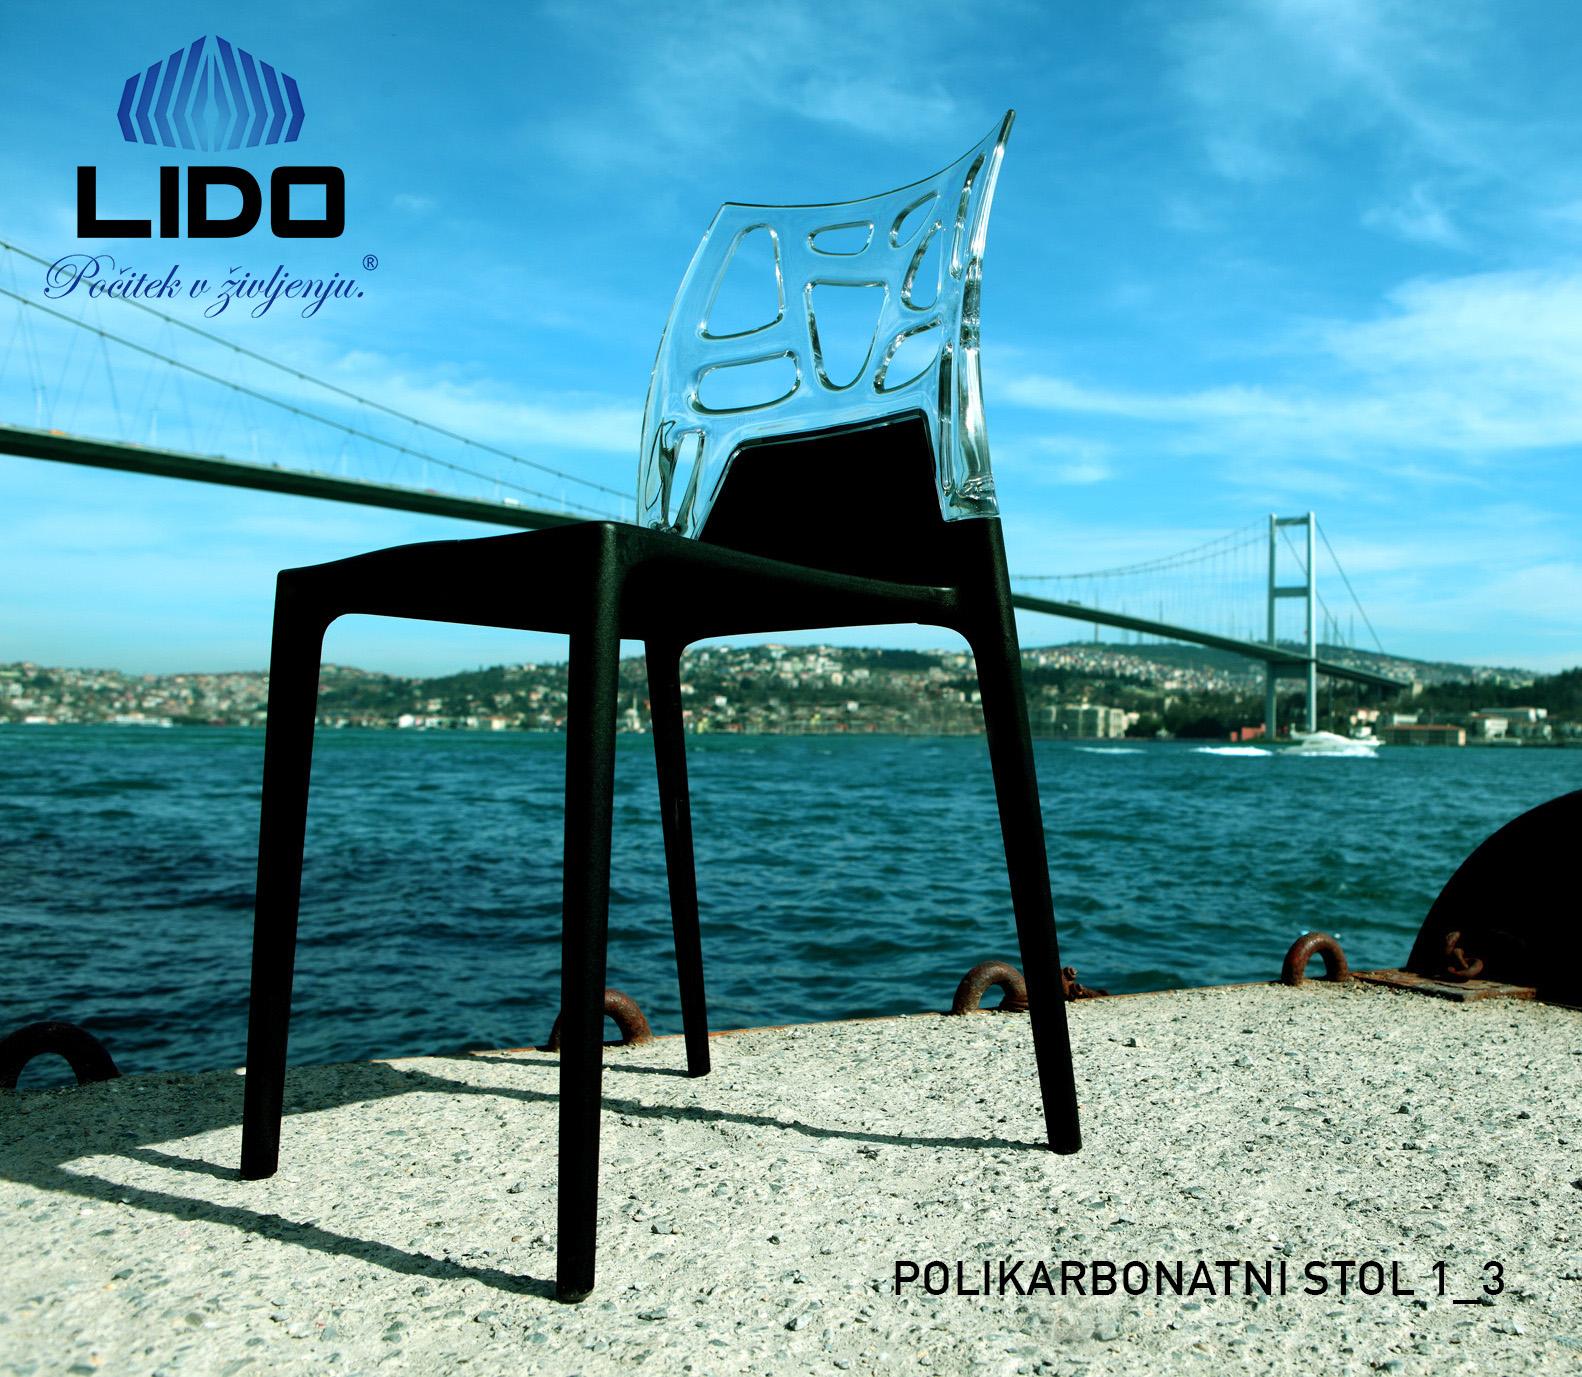 Lido_Polikarbonatni stol 1_3